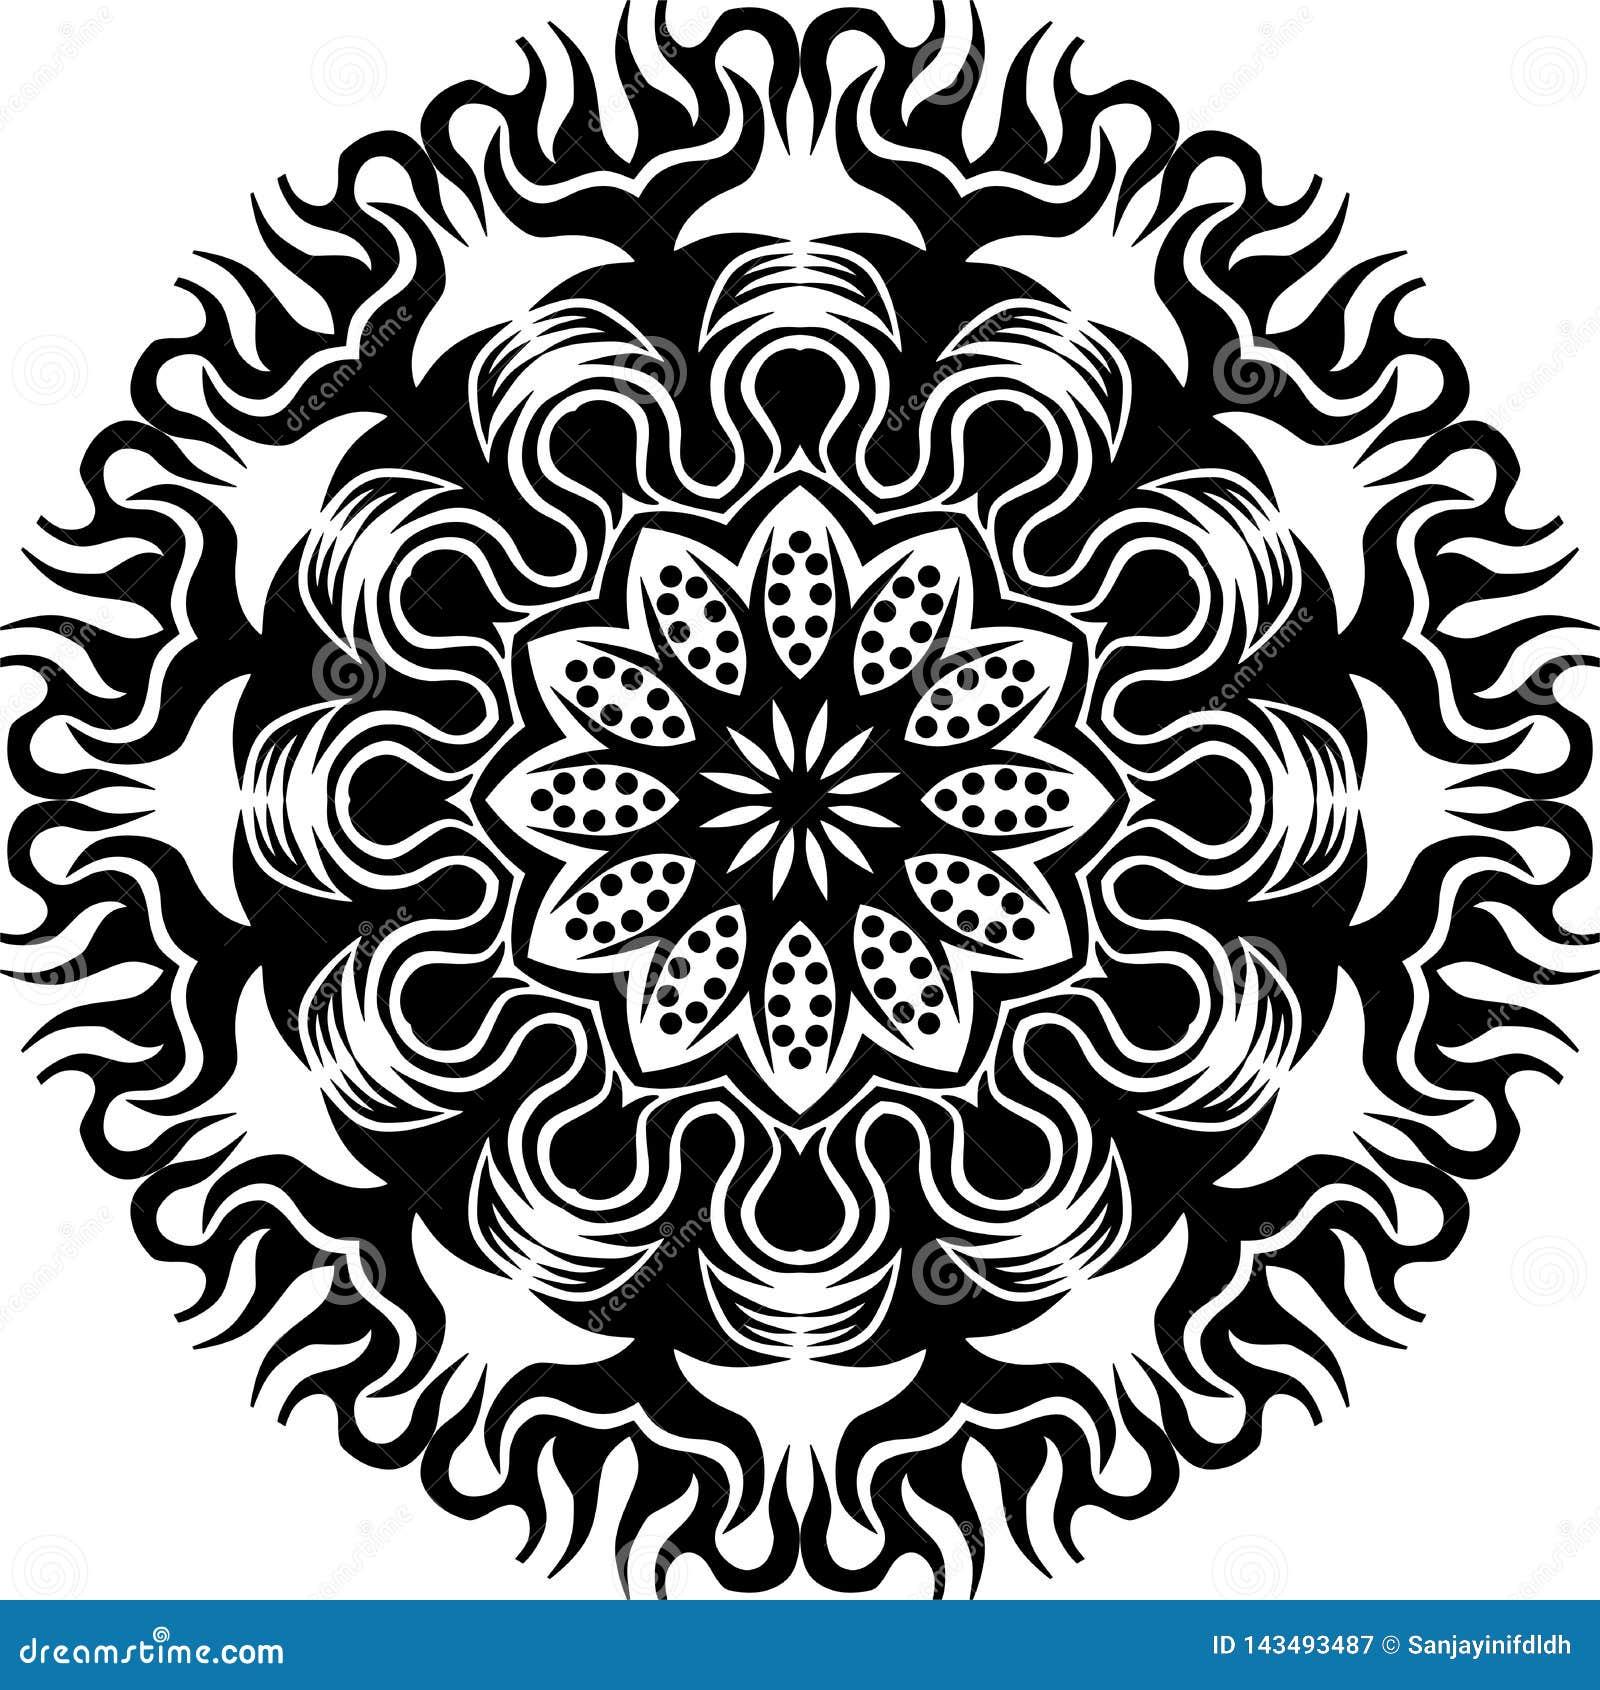 Abstract Circluar Line Art